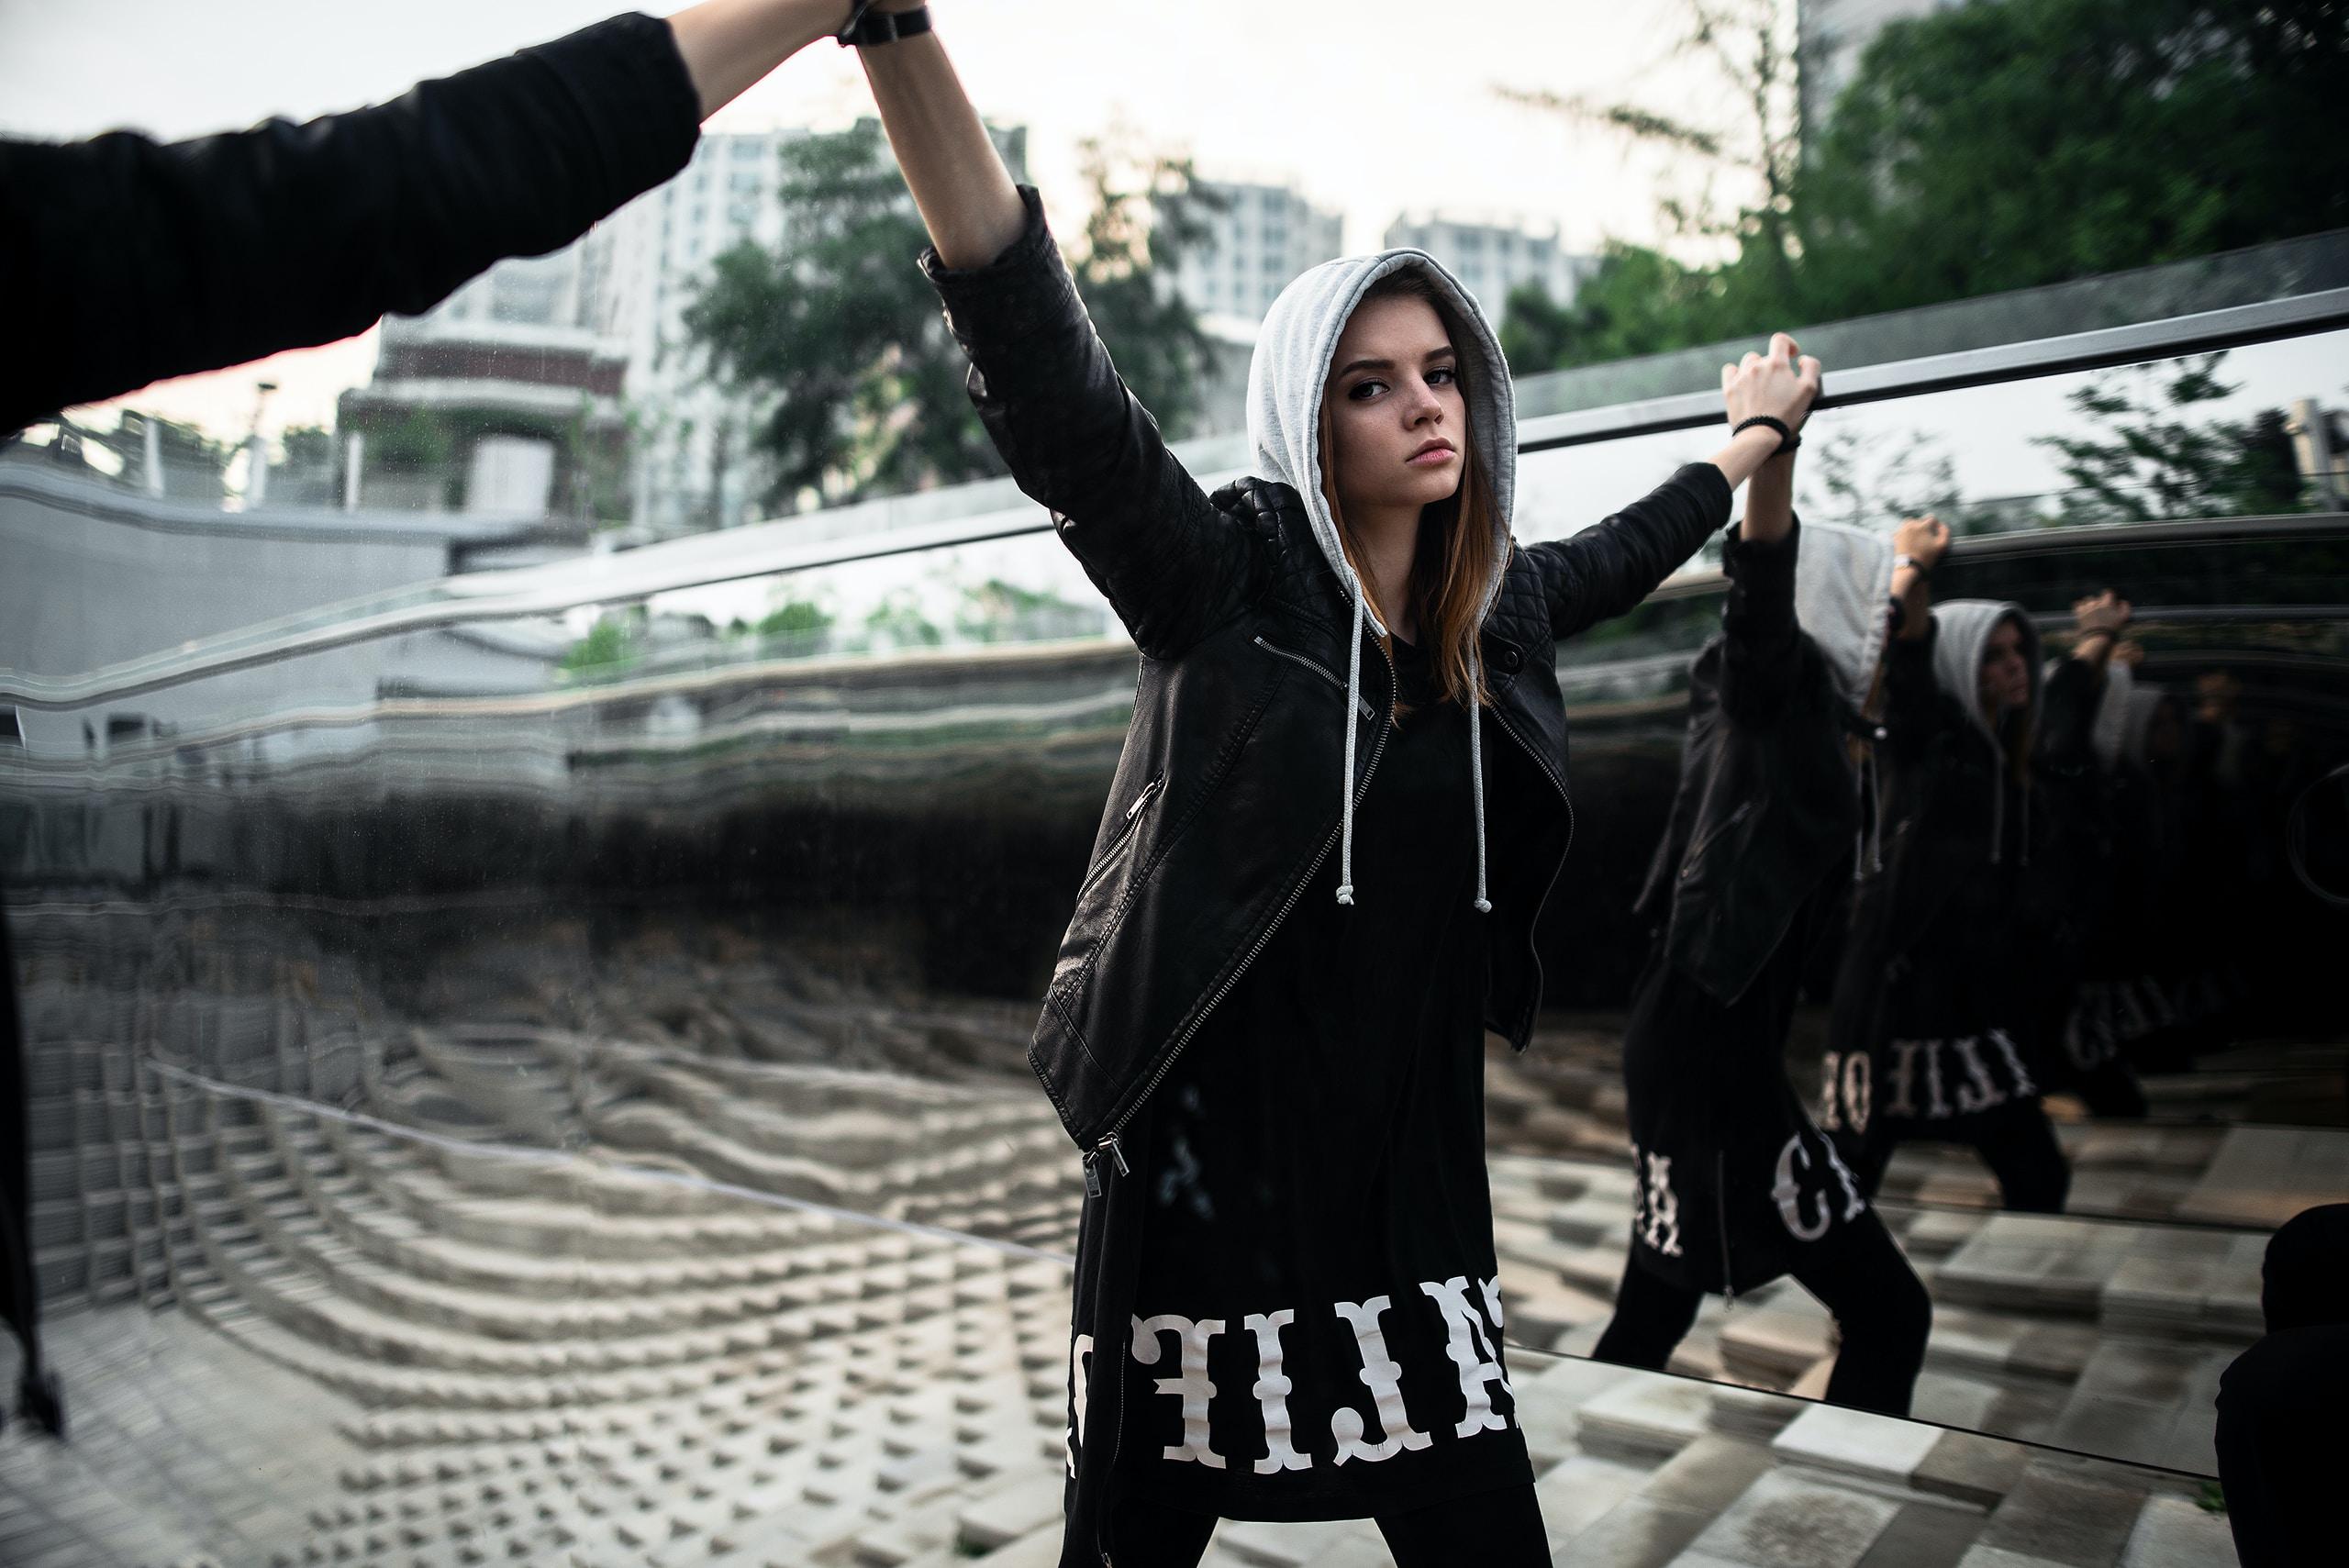 woman wearing black and gray hoodie